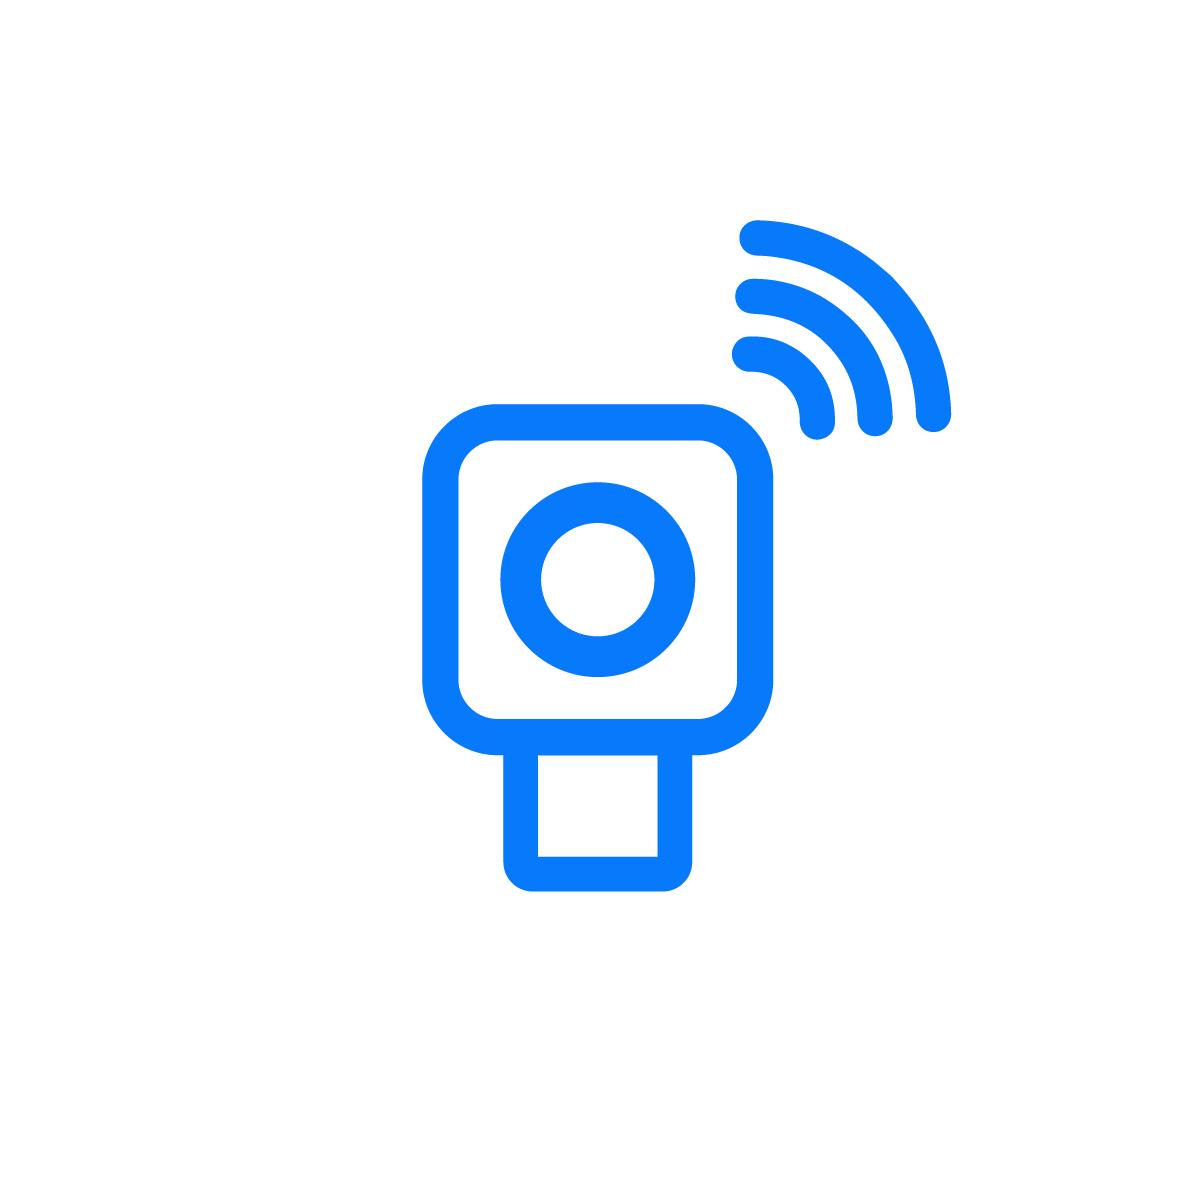 Wi-Fi Based Camera Icon